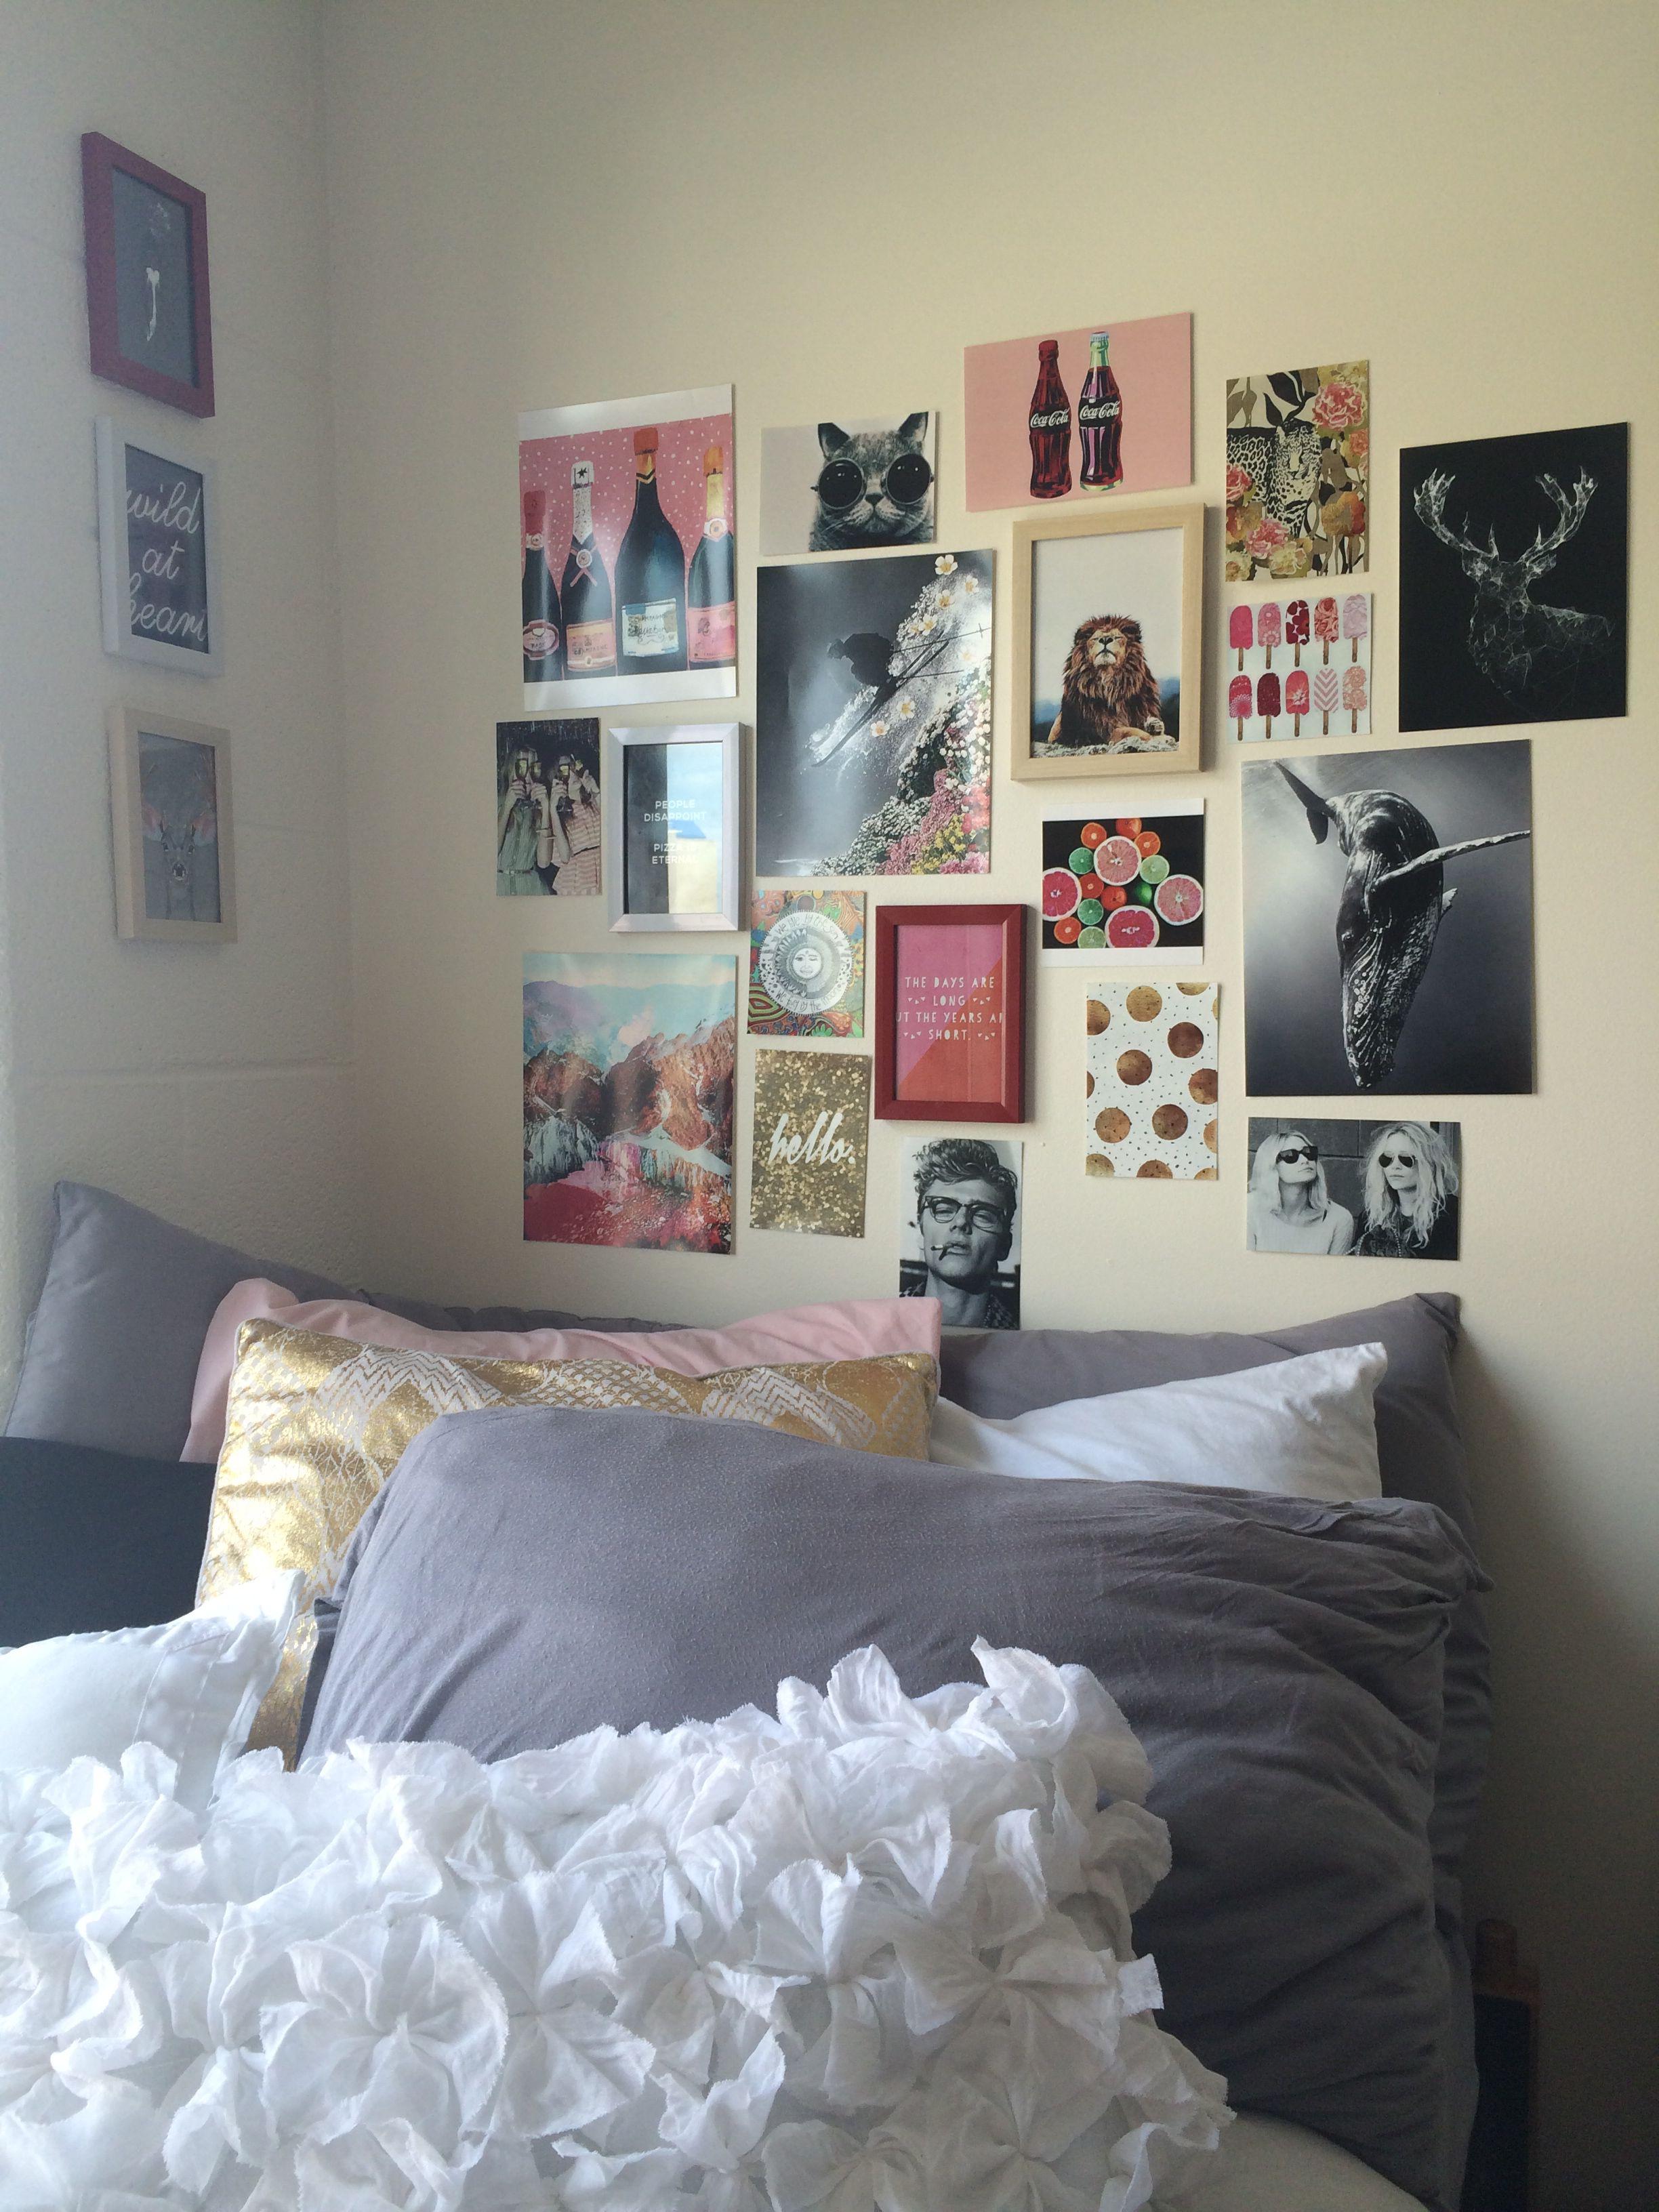 redecorating bedroom%0A Dorm decorating